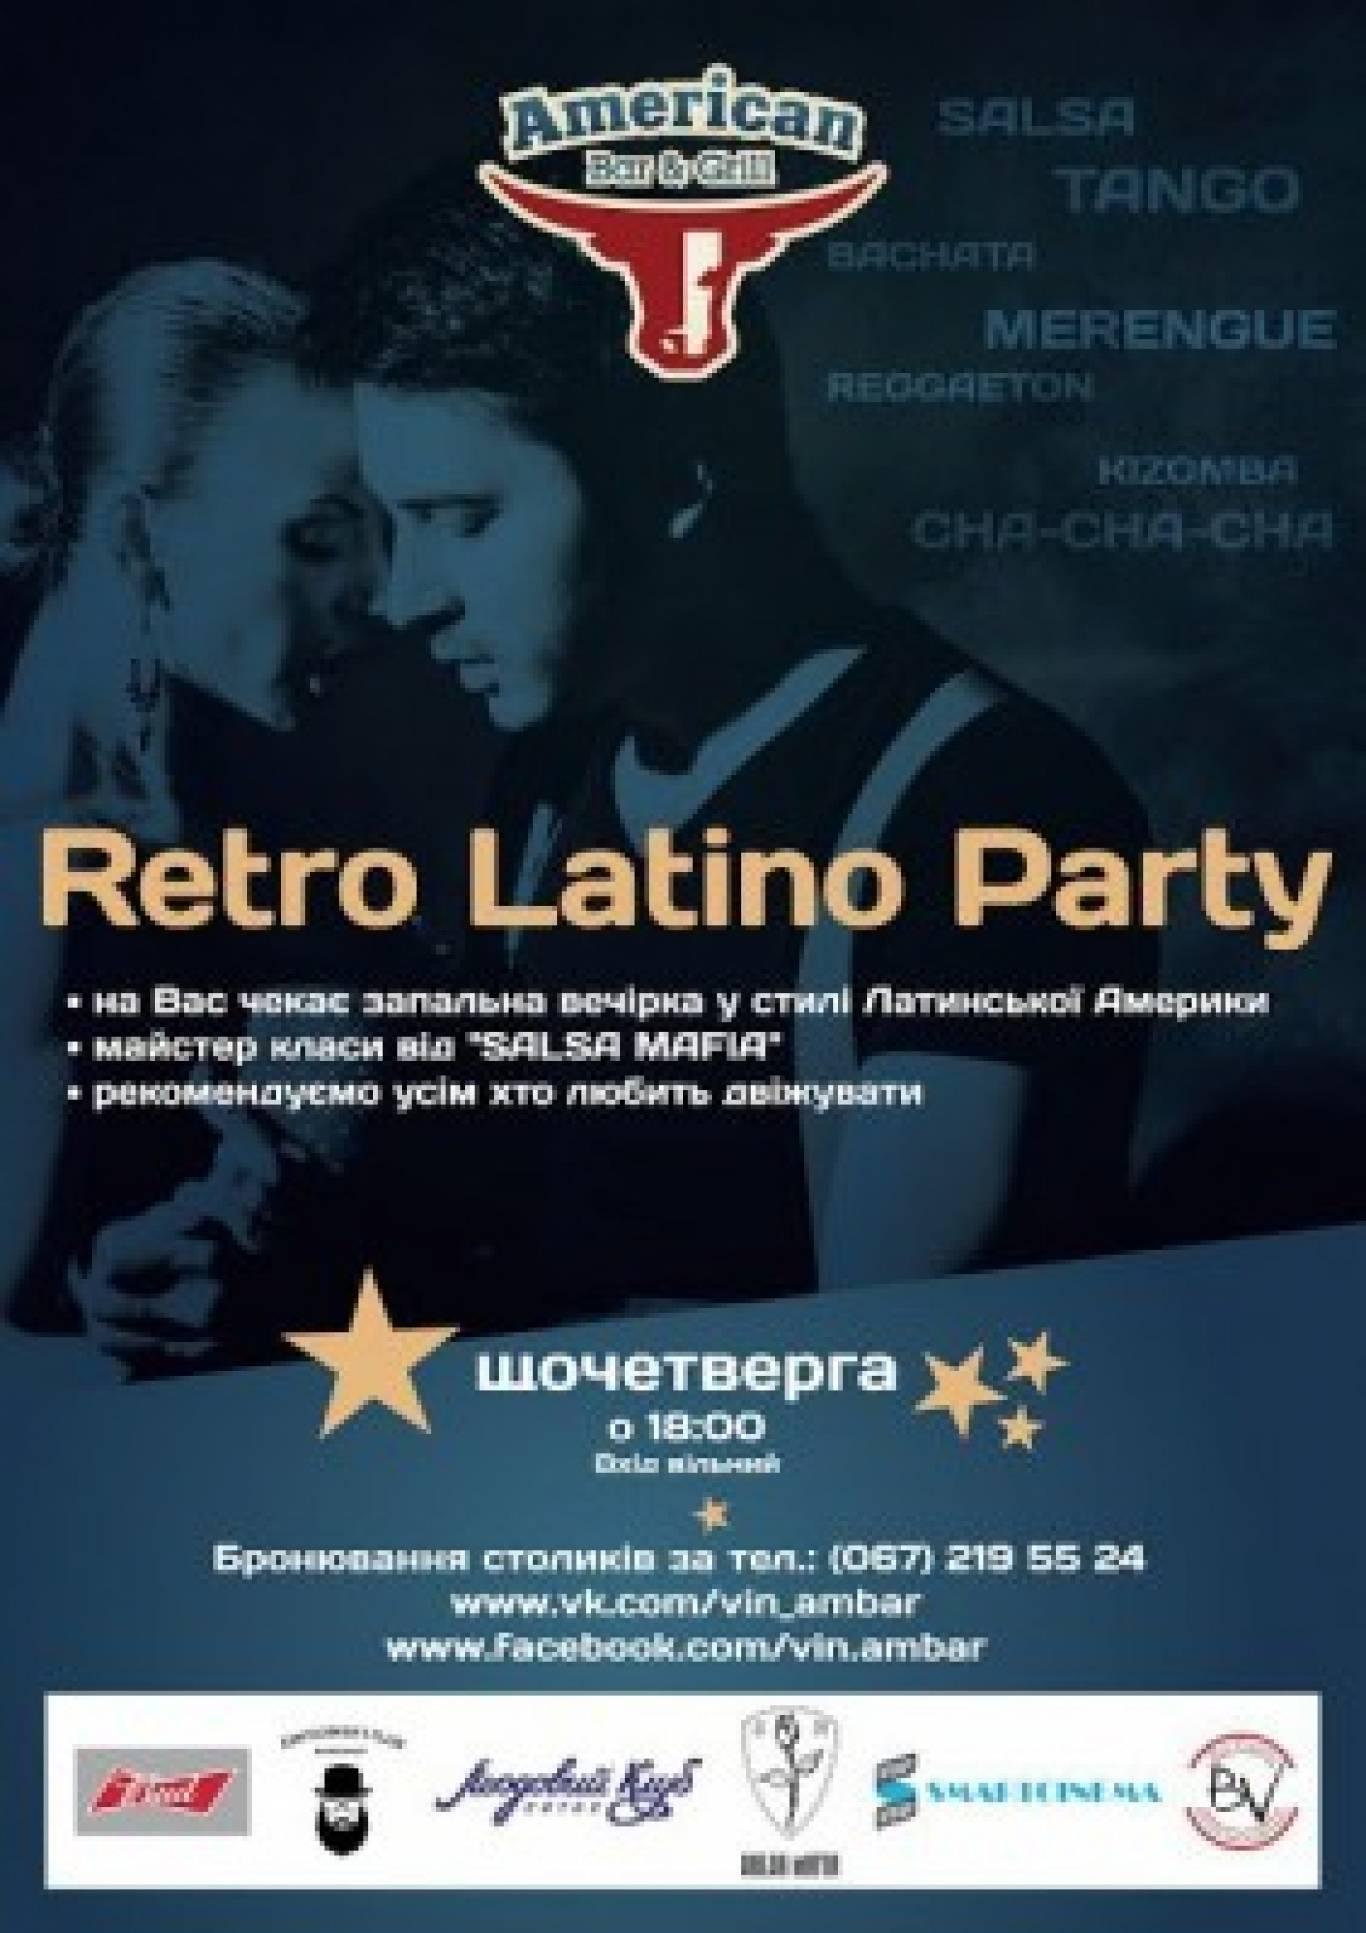 Retro Latino Party